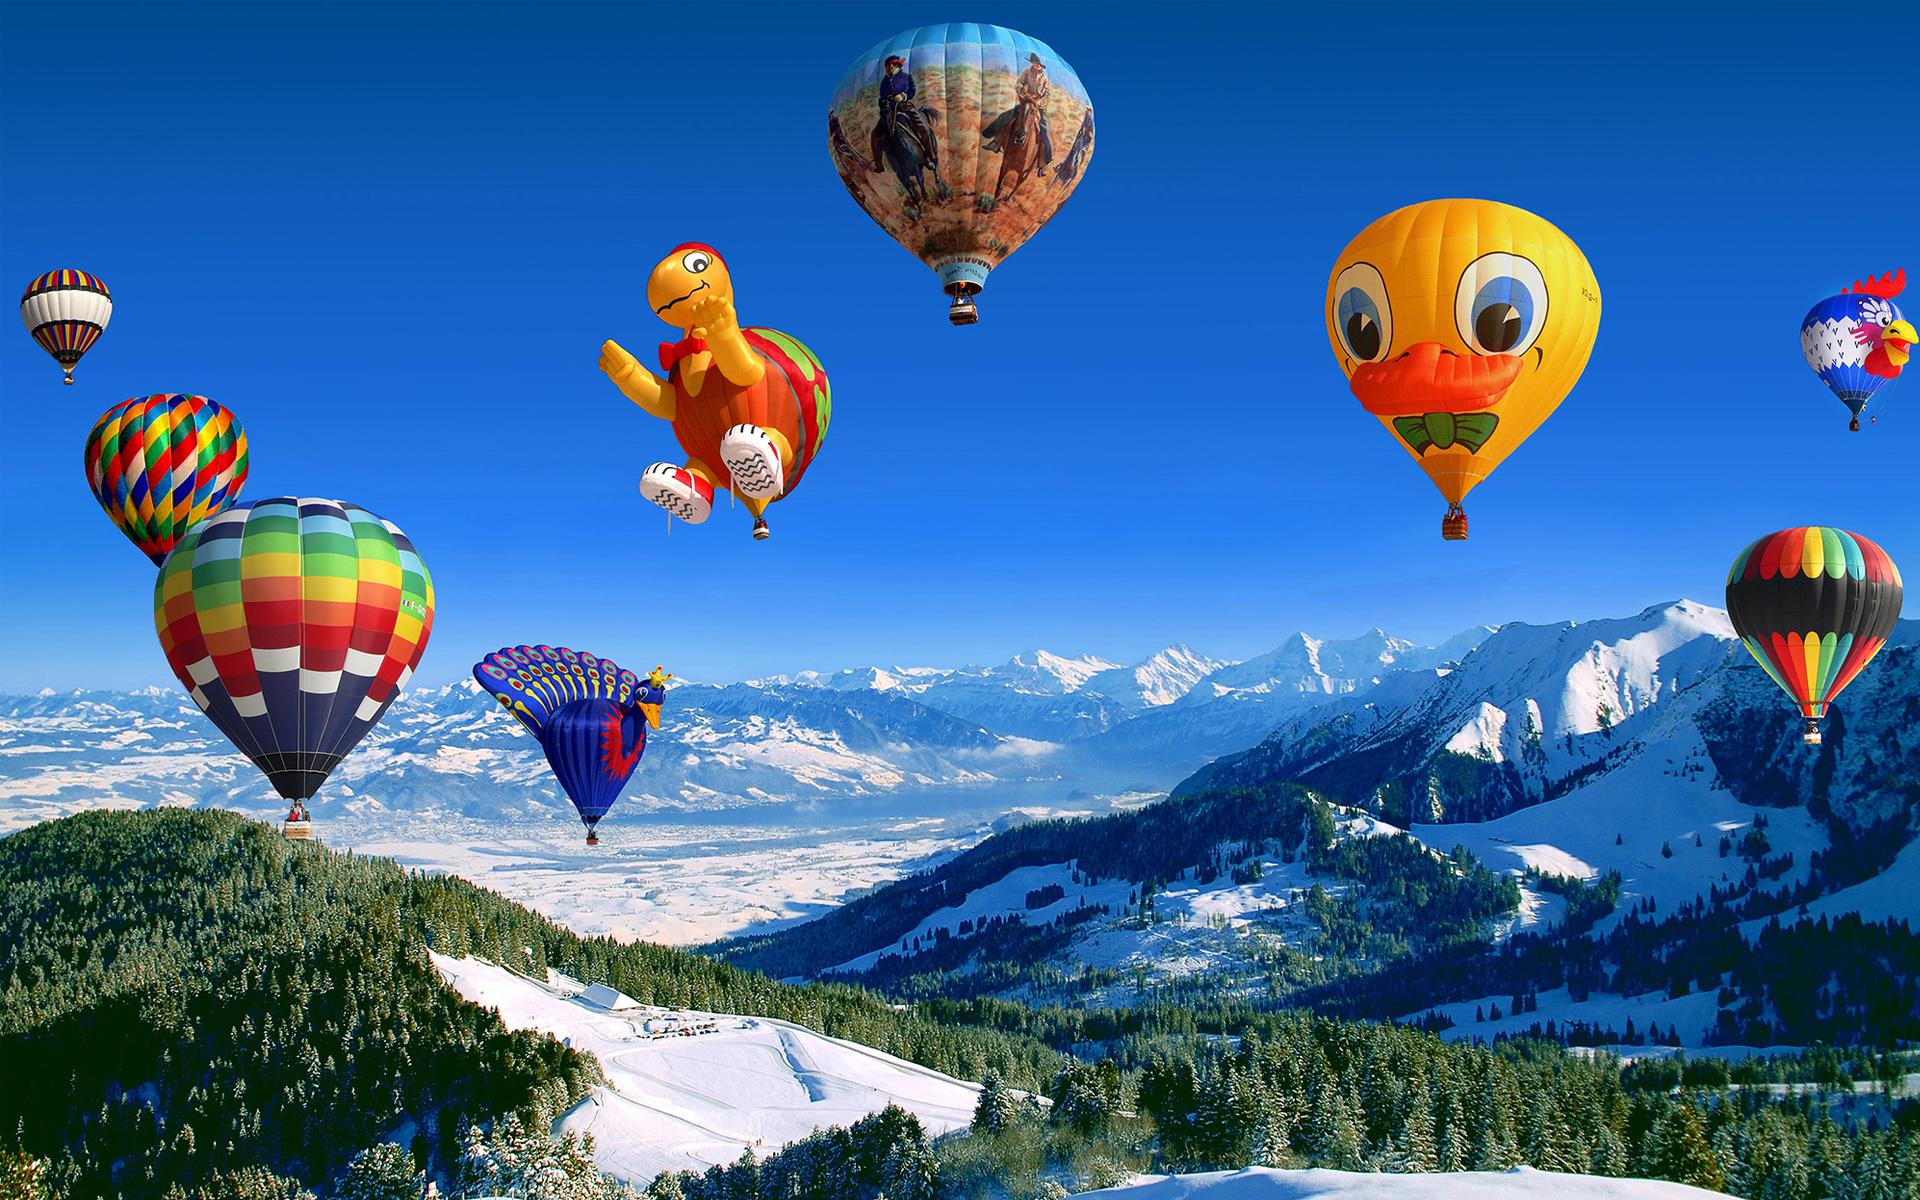 Hot Air Balloon Festival Wallpapers HD Wallpapers 1920x1200